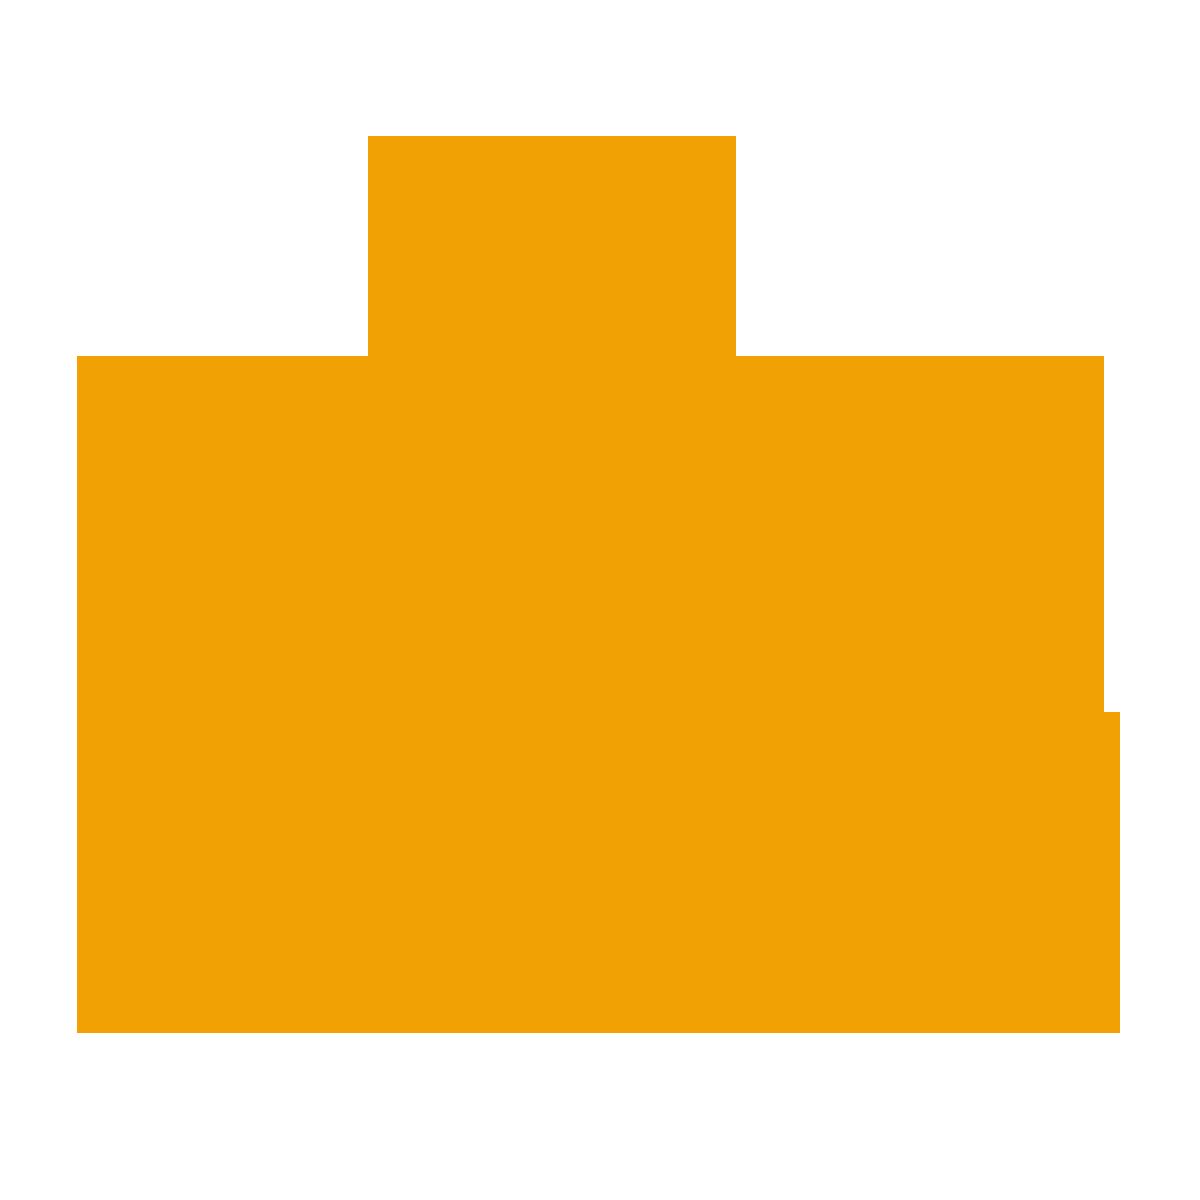 SADEN_ICONO-11-modificacion